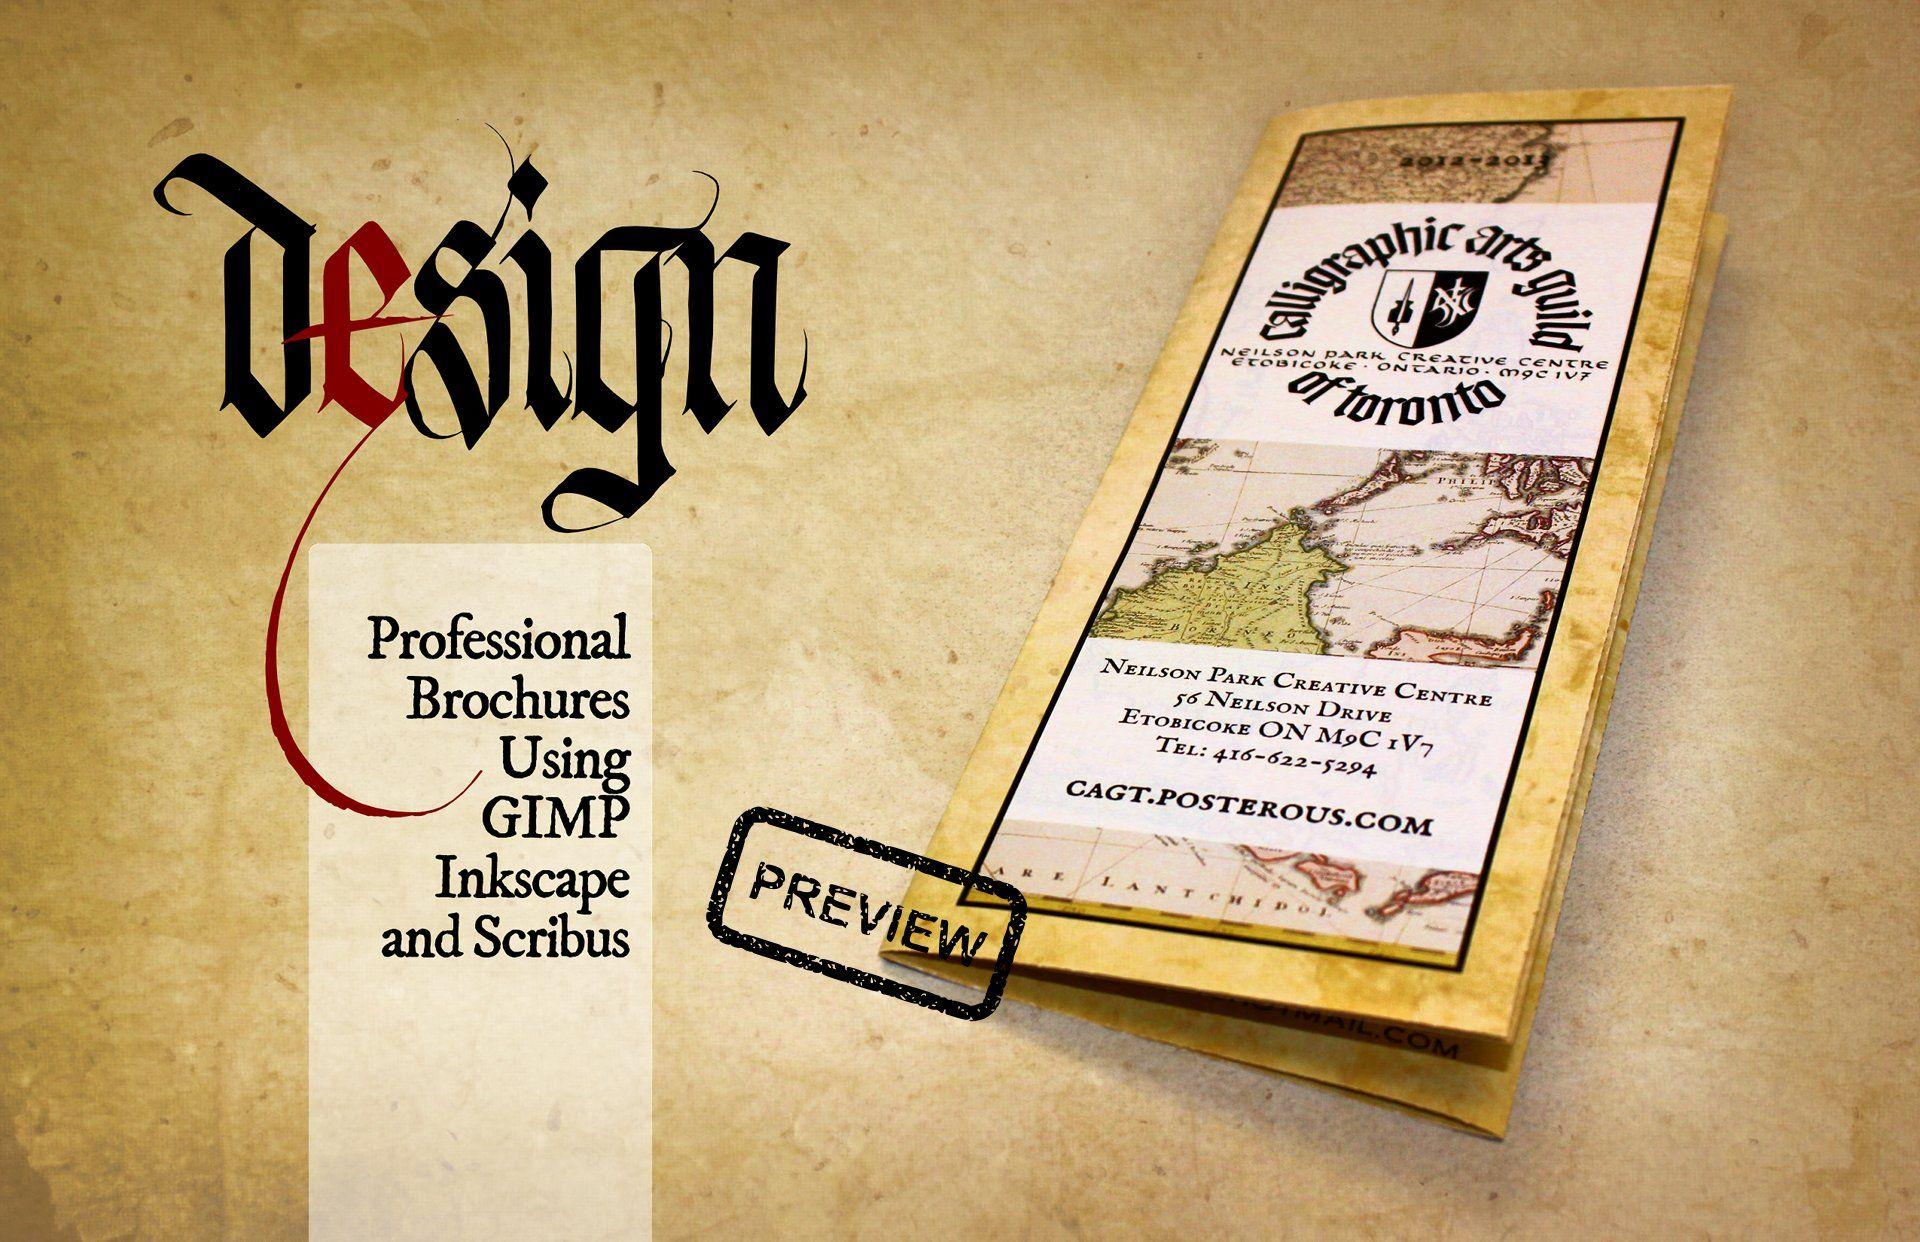 Poster design using gimp - Design Professional Brochures Using Gimp Inkscape And Scribus Written By Steve Czajka Edited